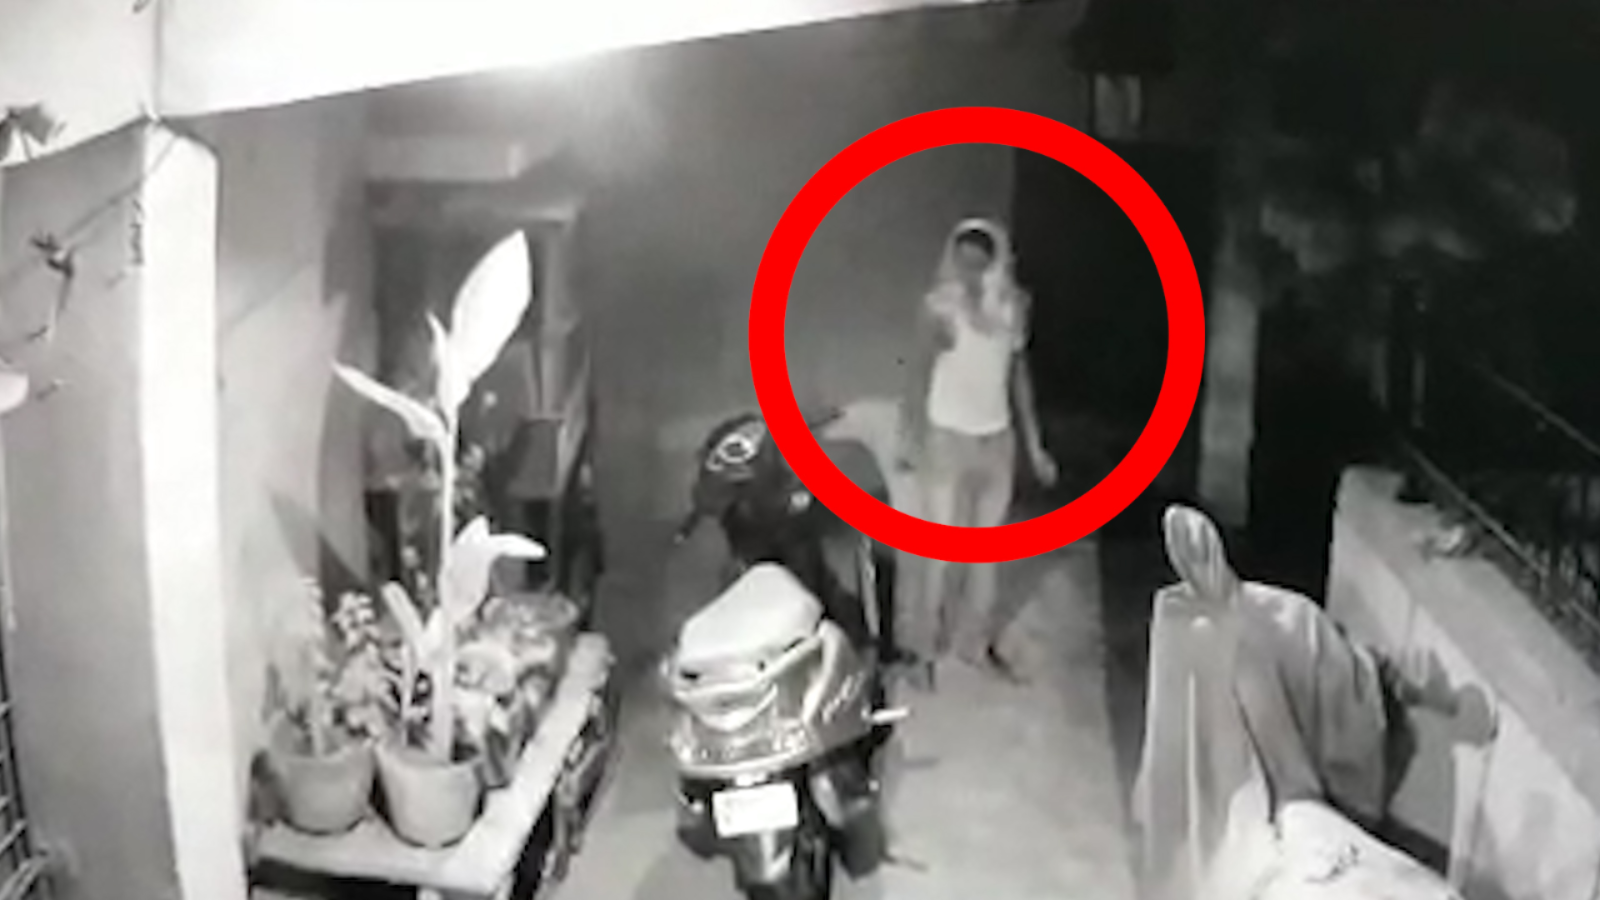 on-cam-delhi-man-seeking-revenge-sets-fire-to-a-scooty-captured-on-cctv